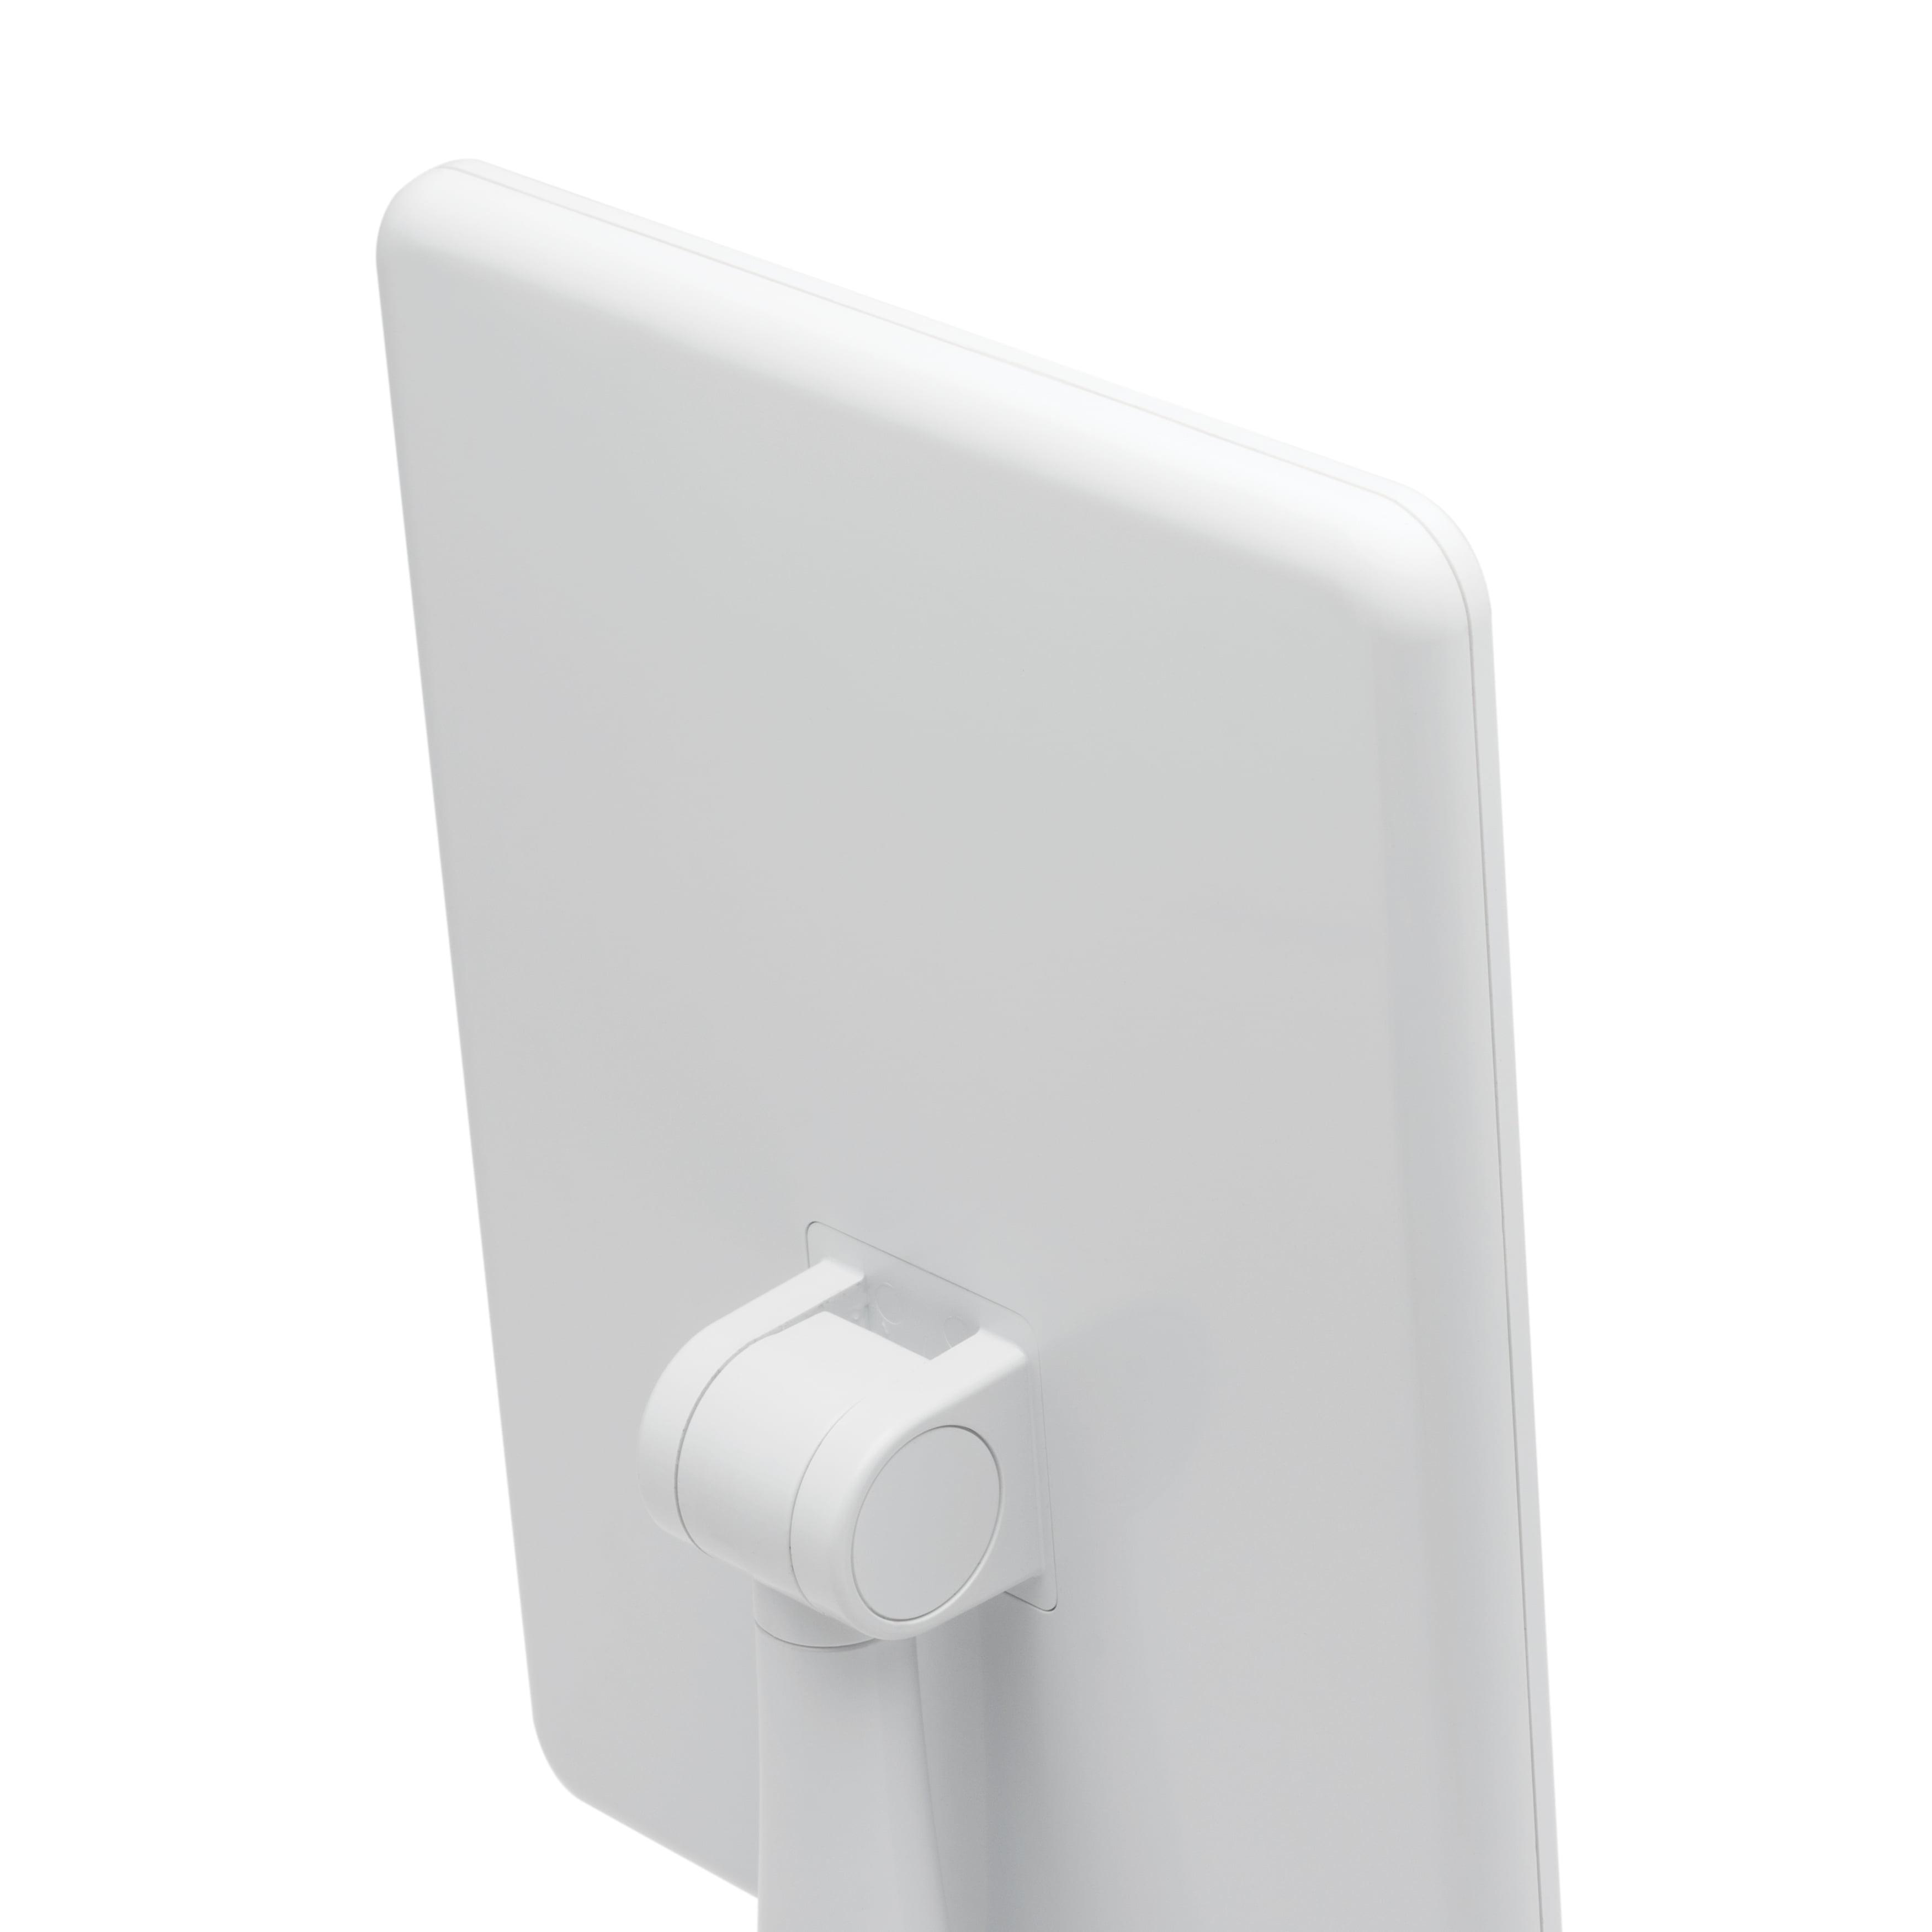 "iHome 7"" x 9"" Reflect iCVBT2 Adjustable Vanity Mirror with Bluetooth Audio, Hands-Free Speakerphone, LED Lighting, Siri & Google Support USB Charging, ..."